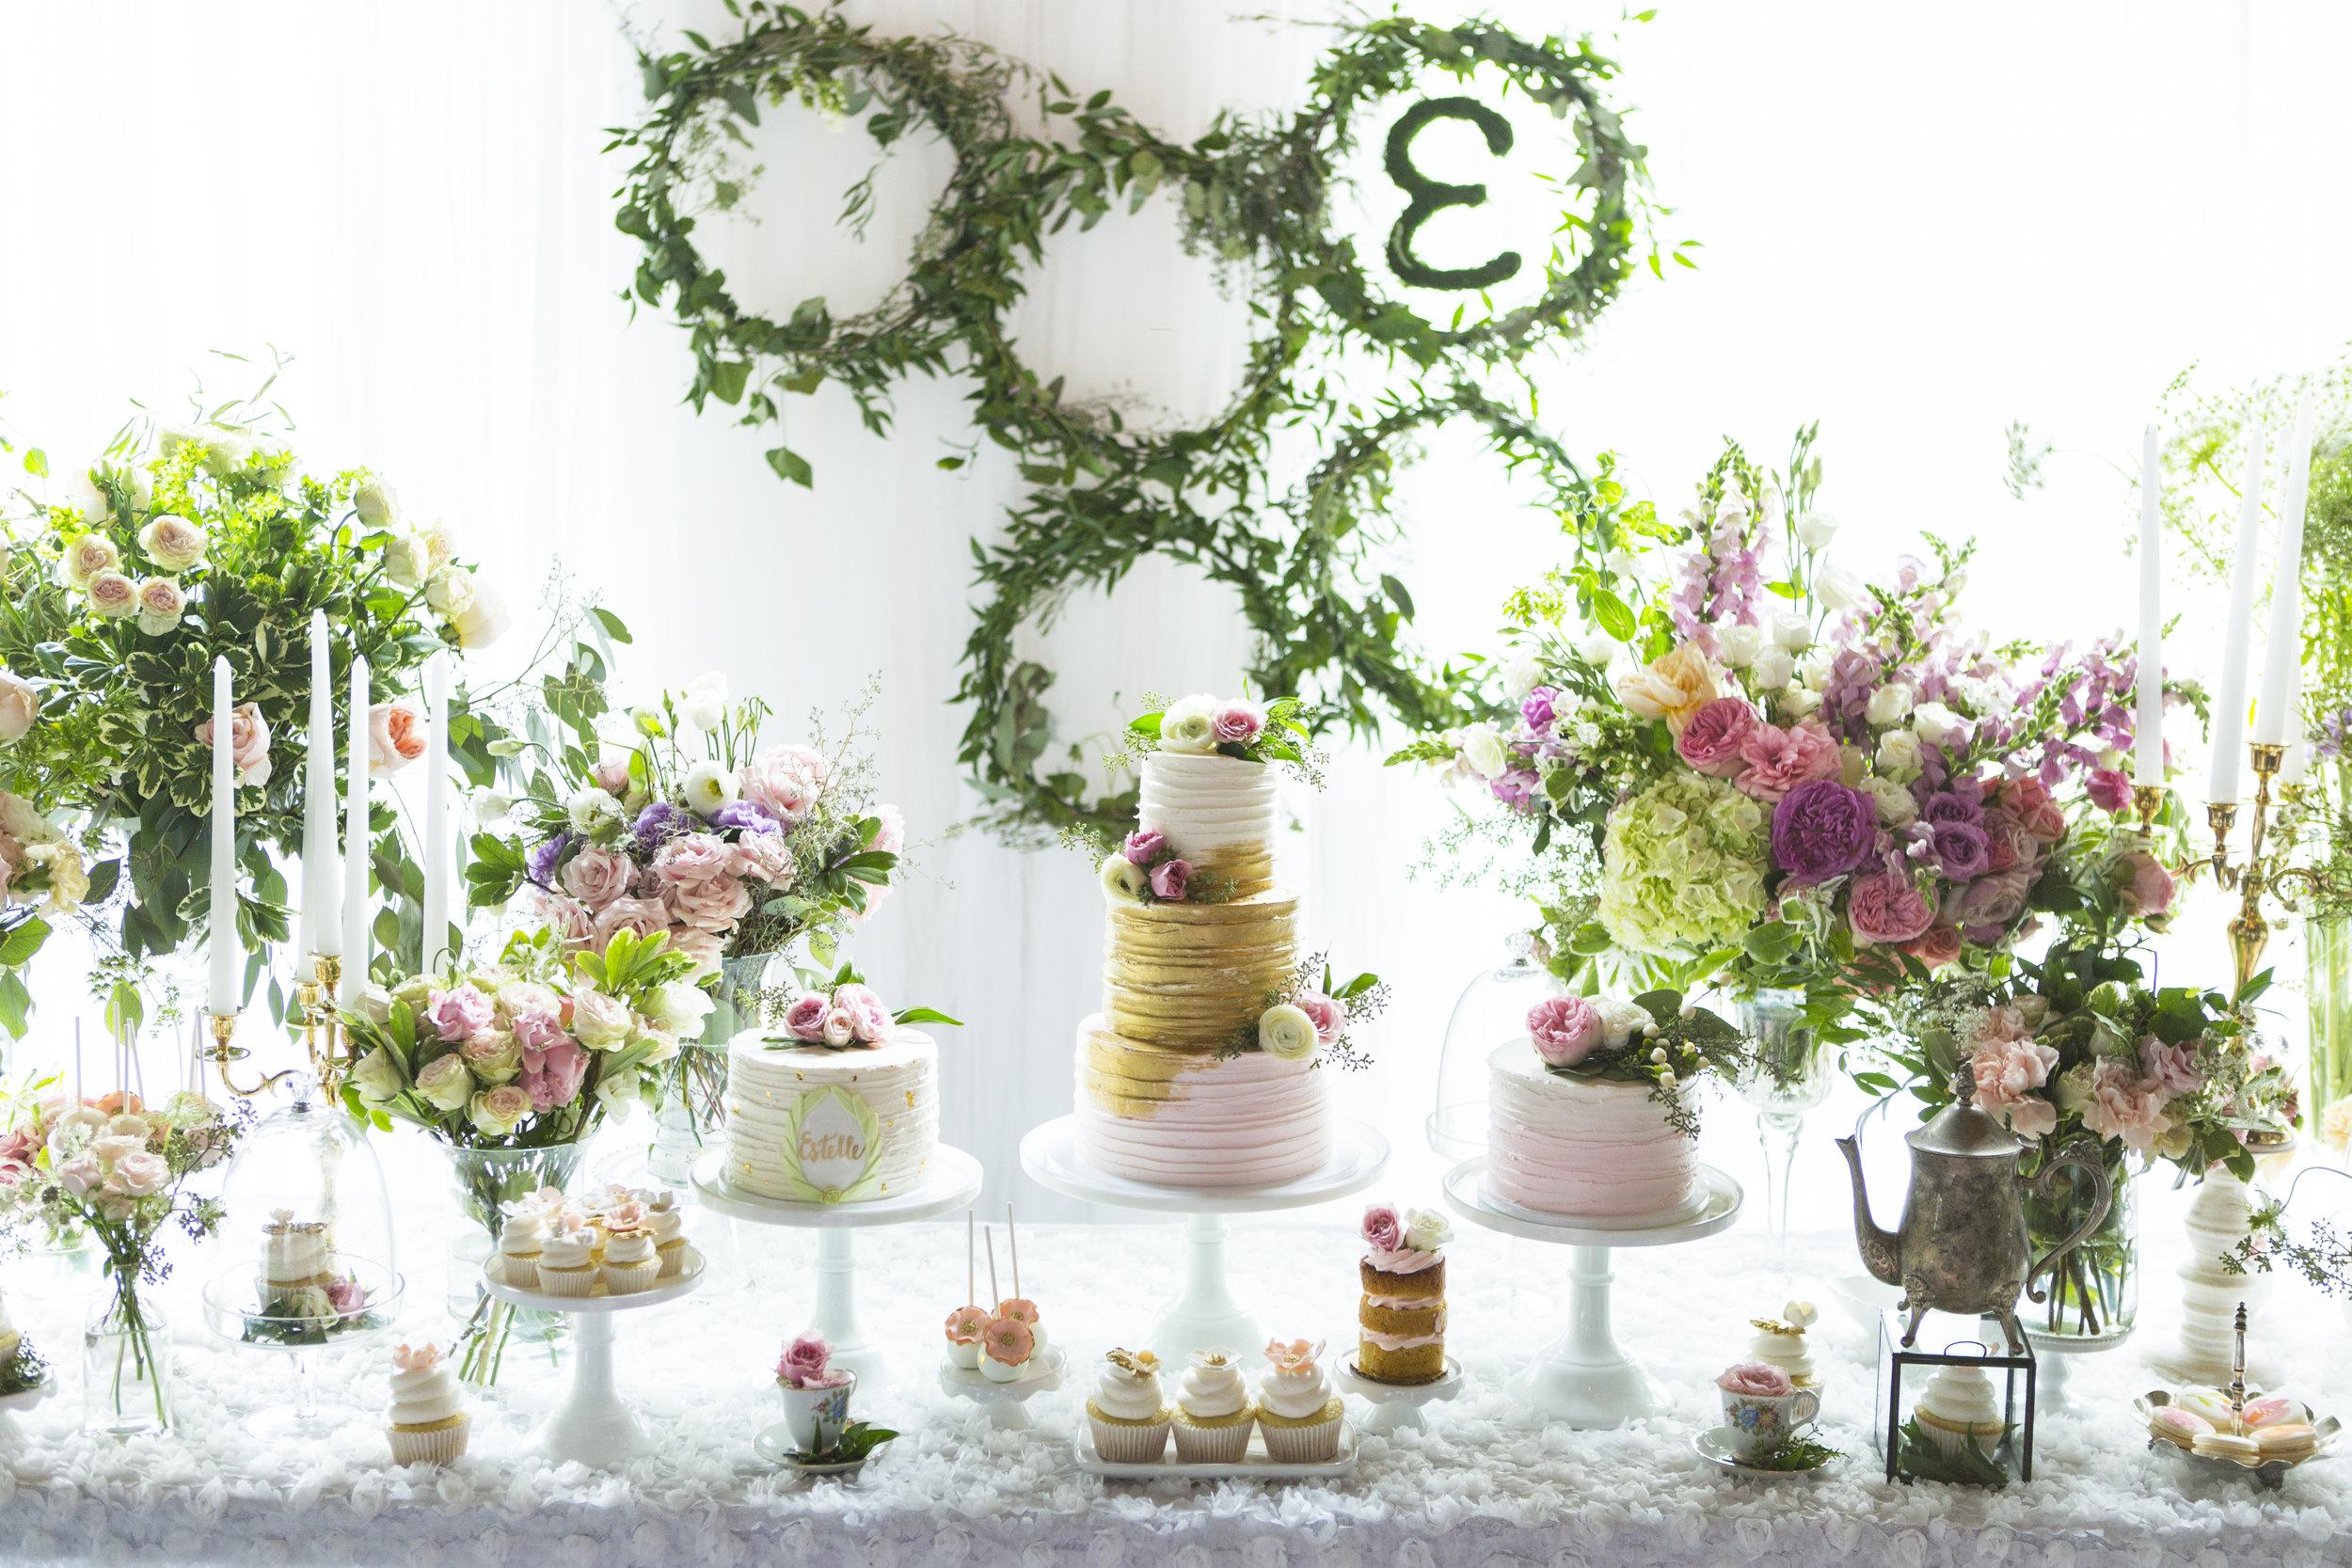 Secret Garden First Birthday Party- Korean first birthday dohl dol doljanchi nyc korean event planner dolsang flower birthday cake.jpg